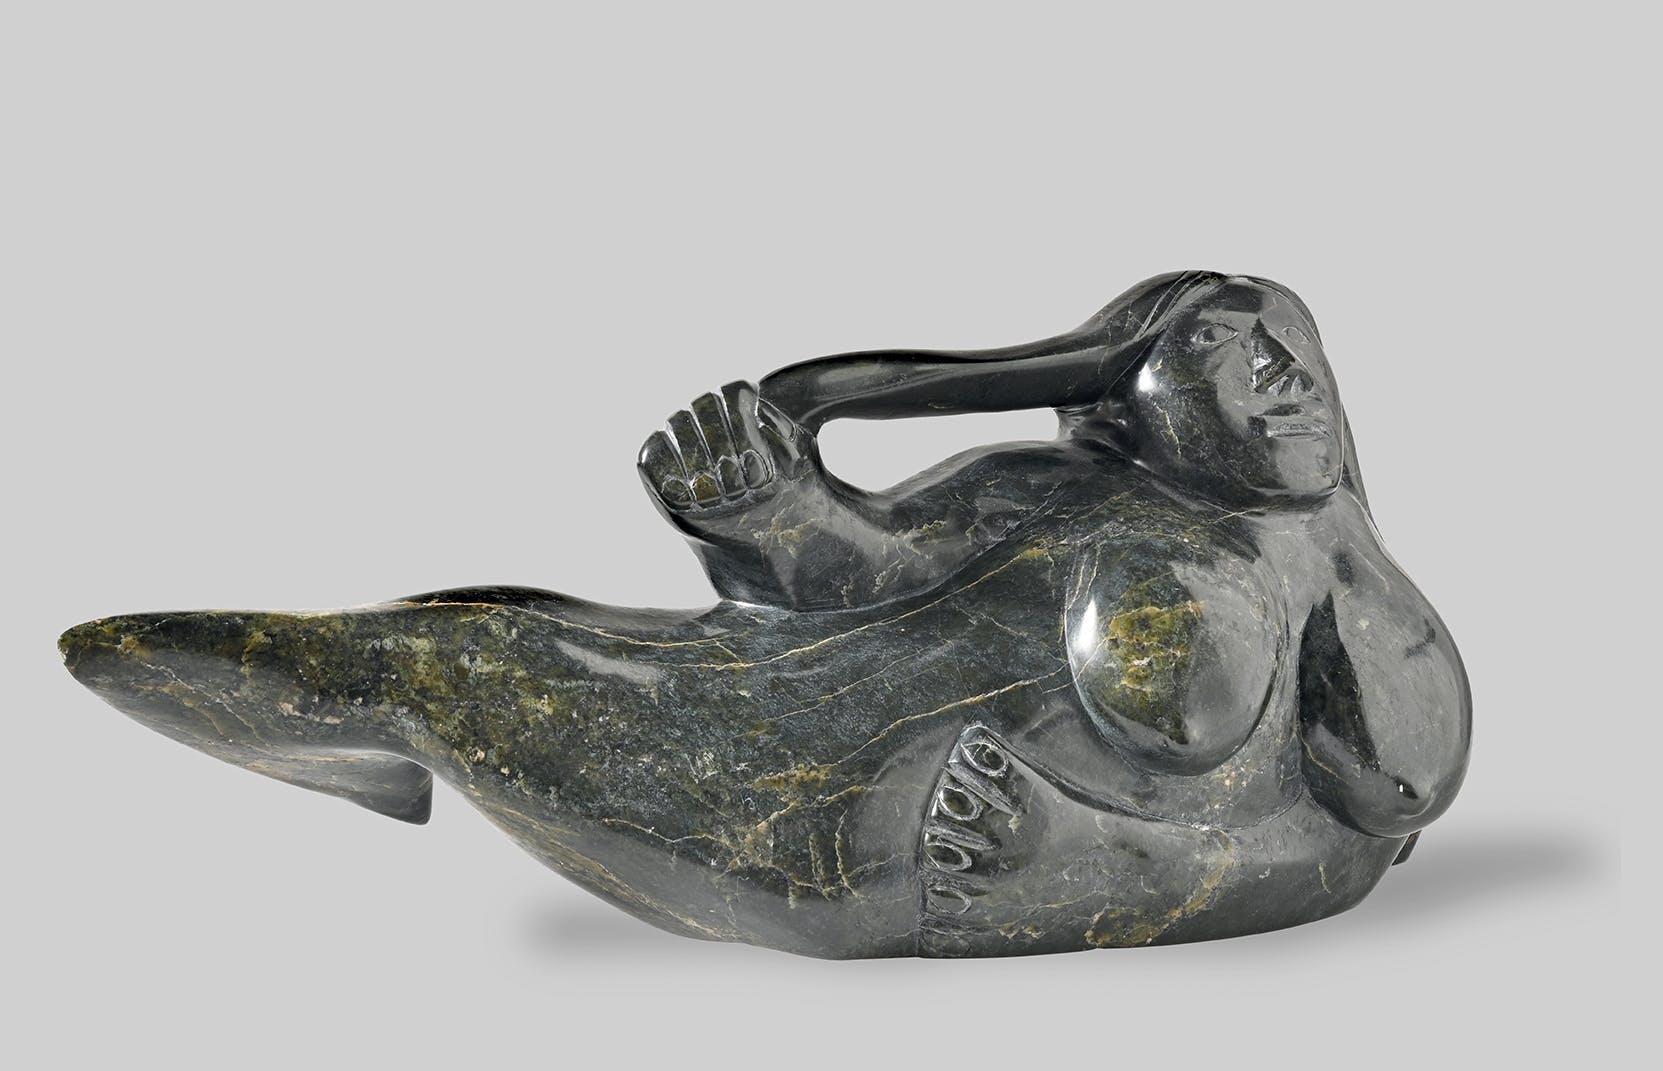 Sedna. Geschaffen von Ohito Ashoona, Inuit, 1997, Cape Dorset, Nunavut, Kanada. Serpentin. Bern, Museum Cerny. Contemporary Circumpolar Art.